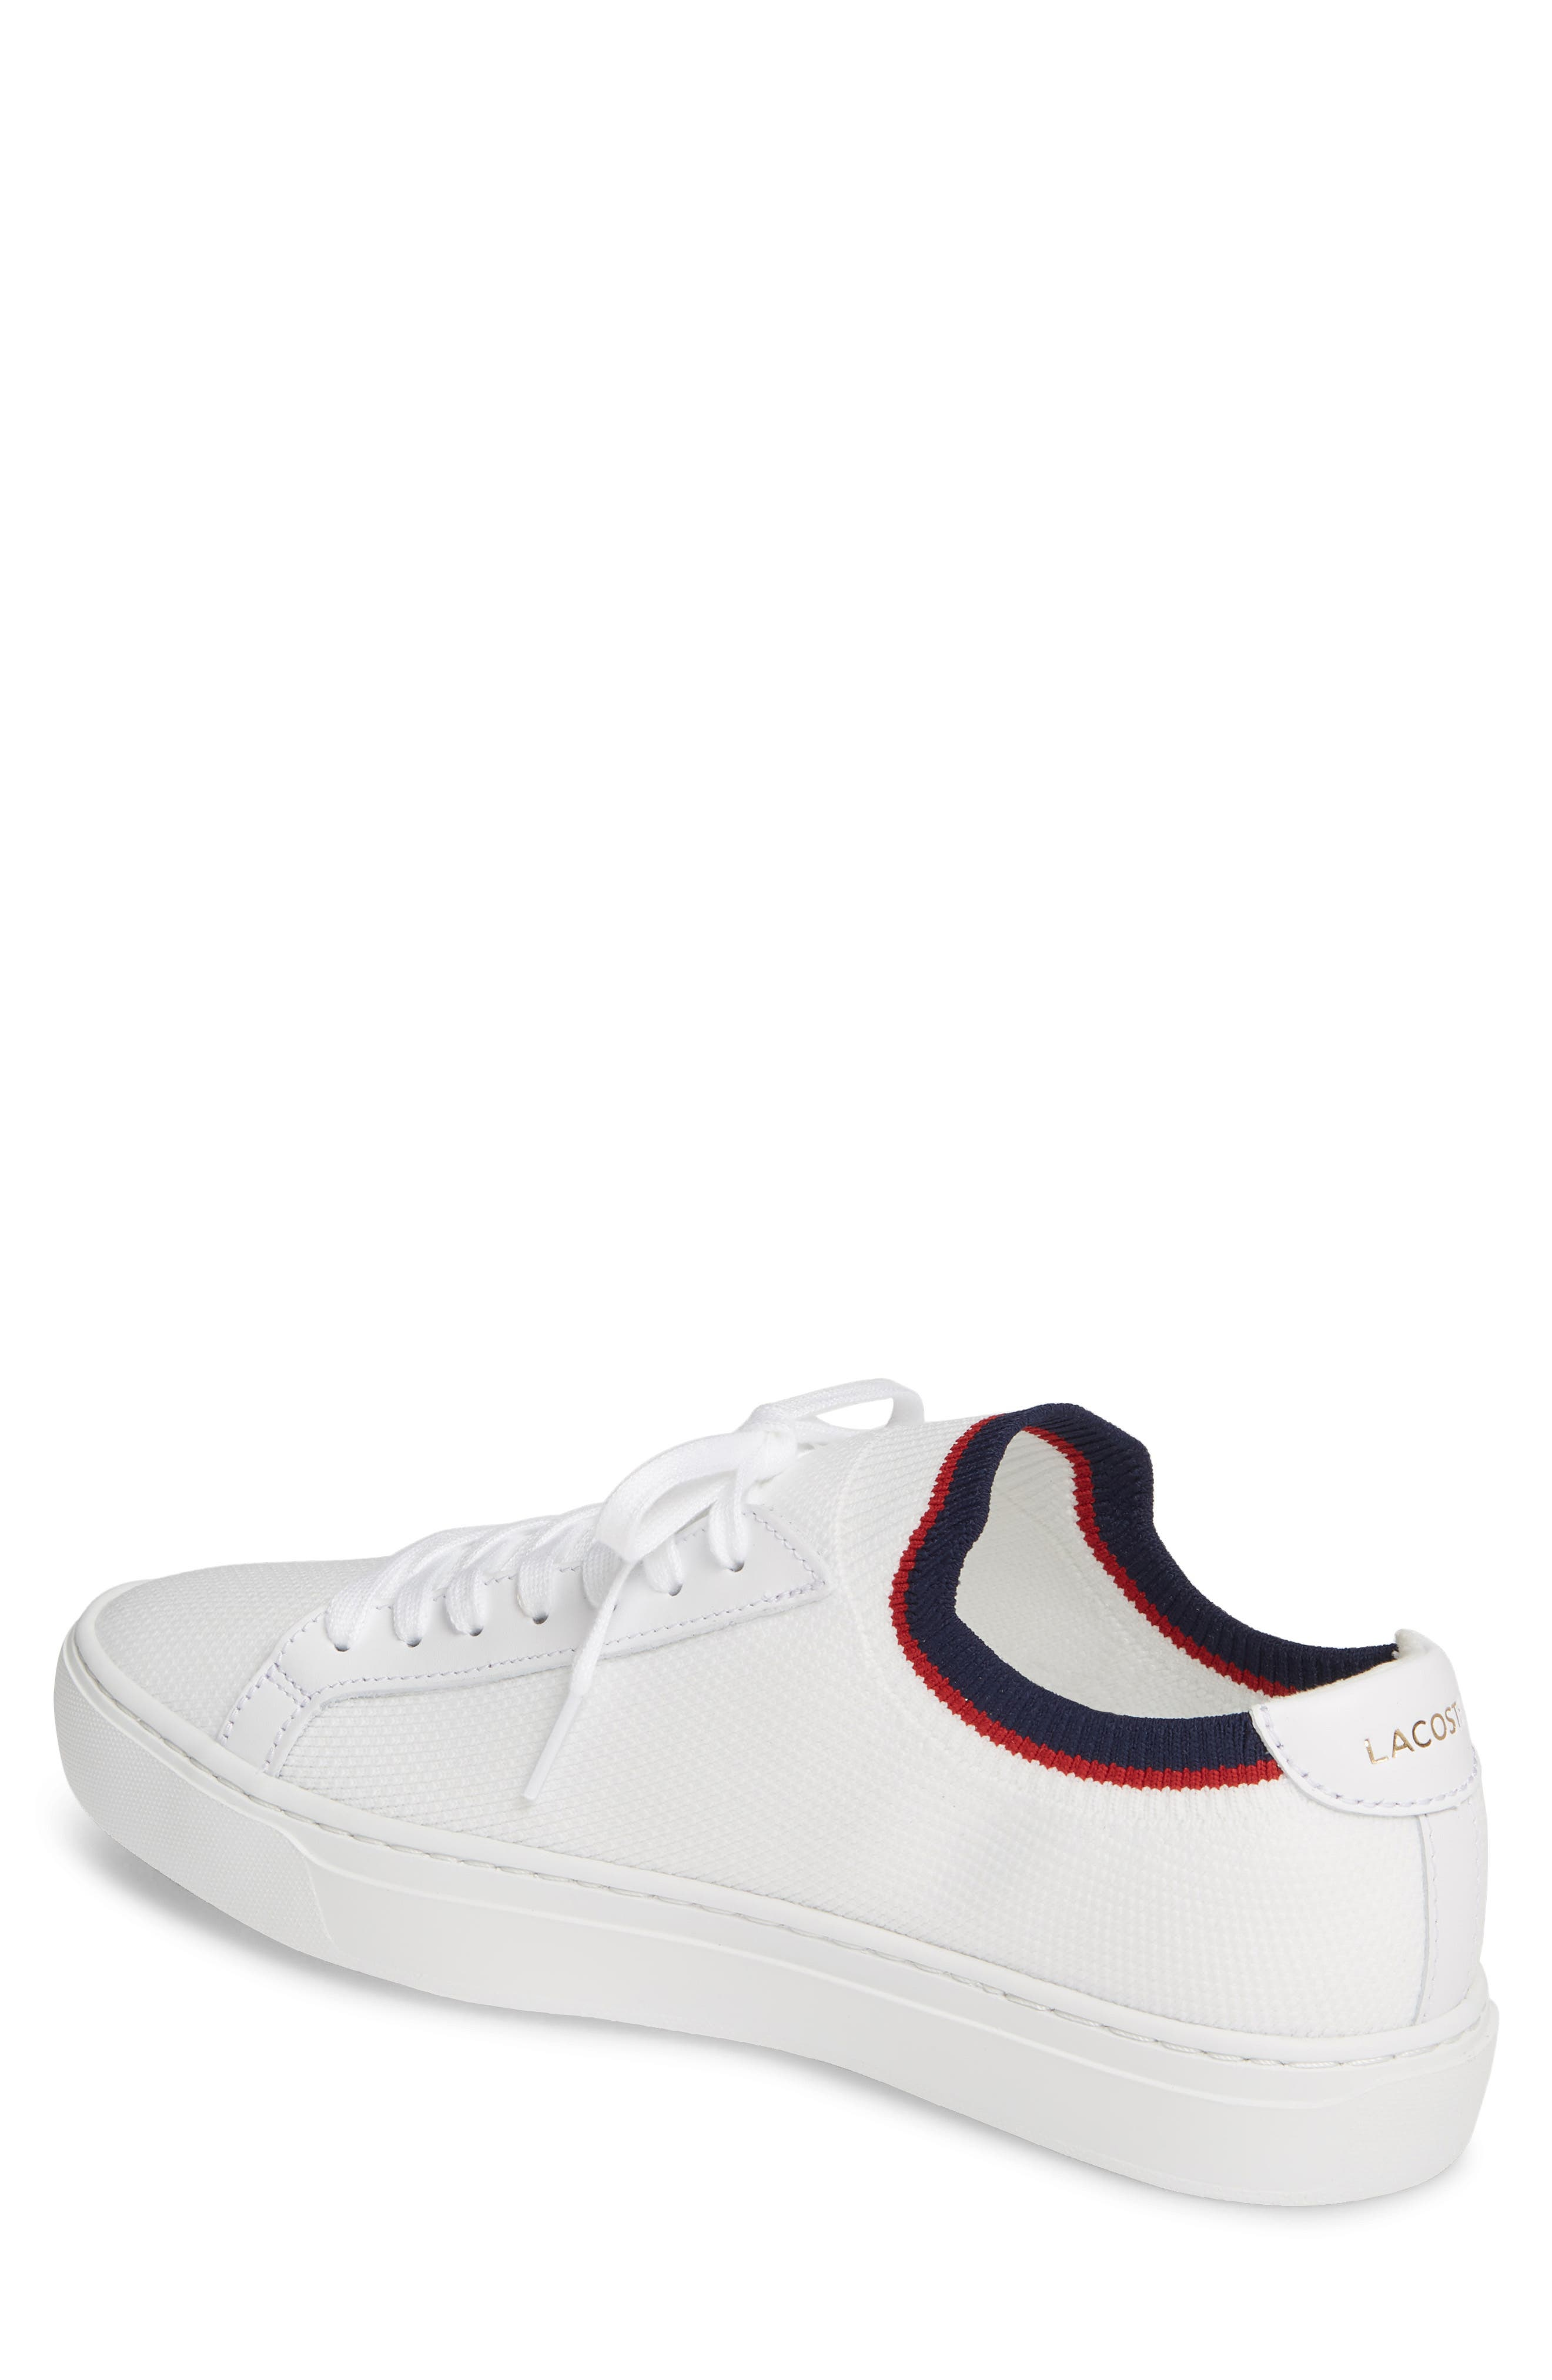 LACOSTE, Piqué Knit Sneaker, Alternate thumbnail 2, color, WHITE/ NAVY/ RED